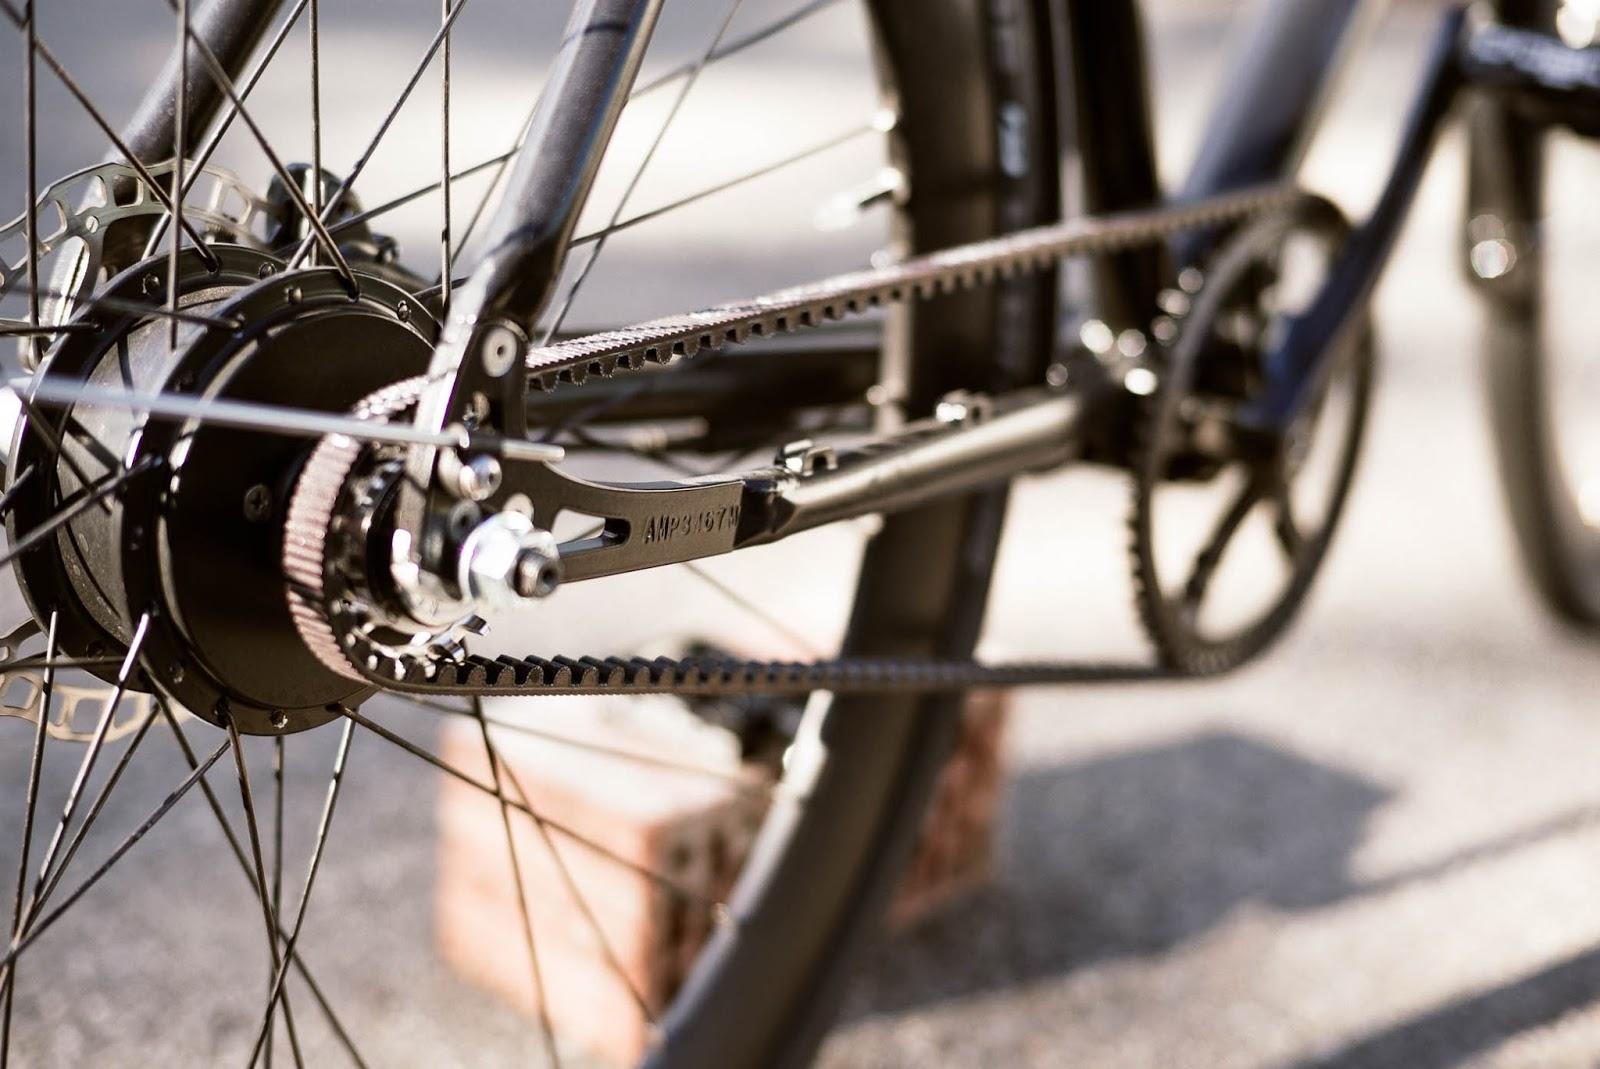 AMPLER HAWK E-Bike in Singlespeed Look und App-Konnektivität ...